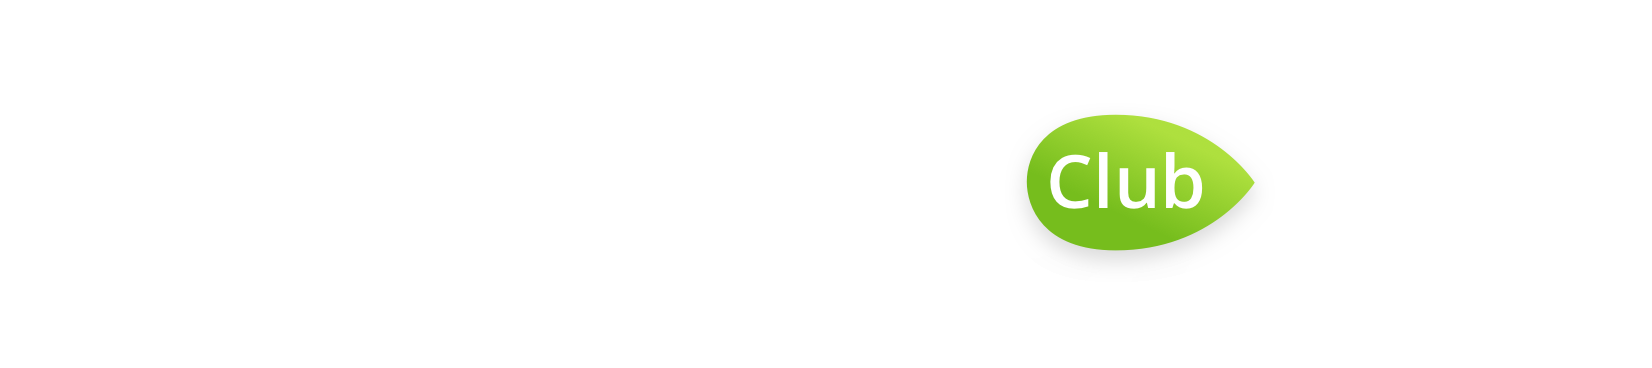 club-banner-logo-trade@2x